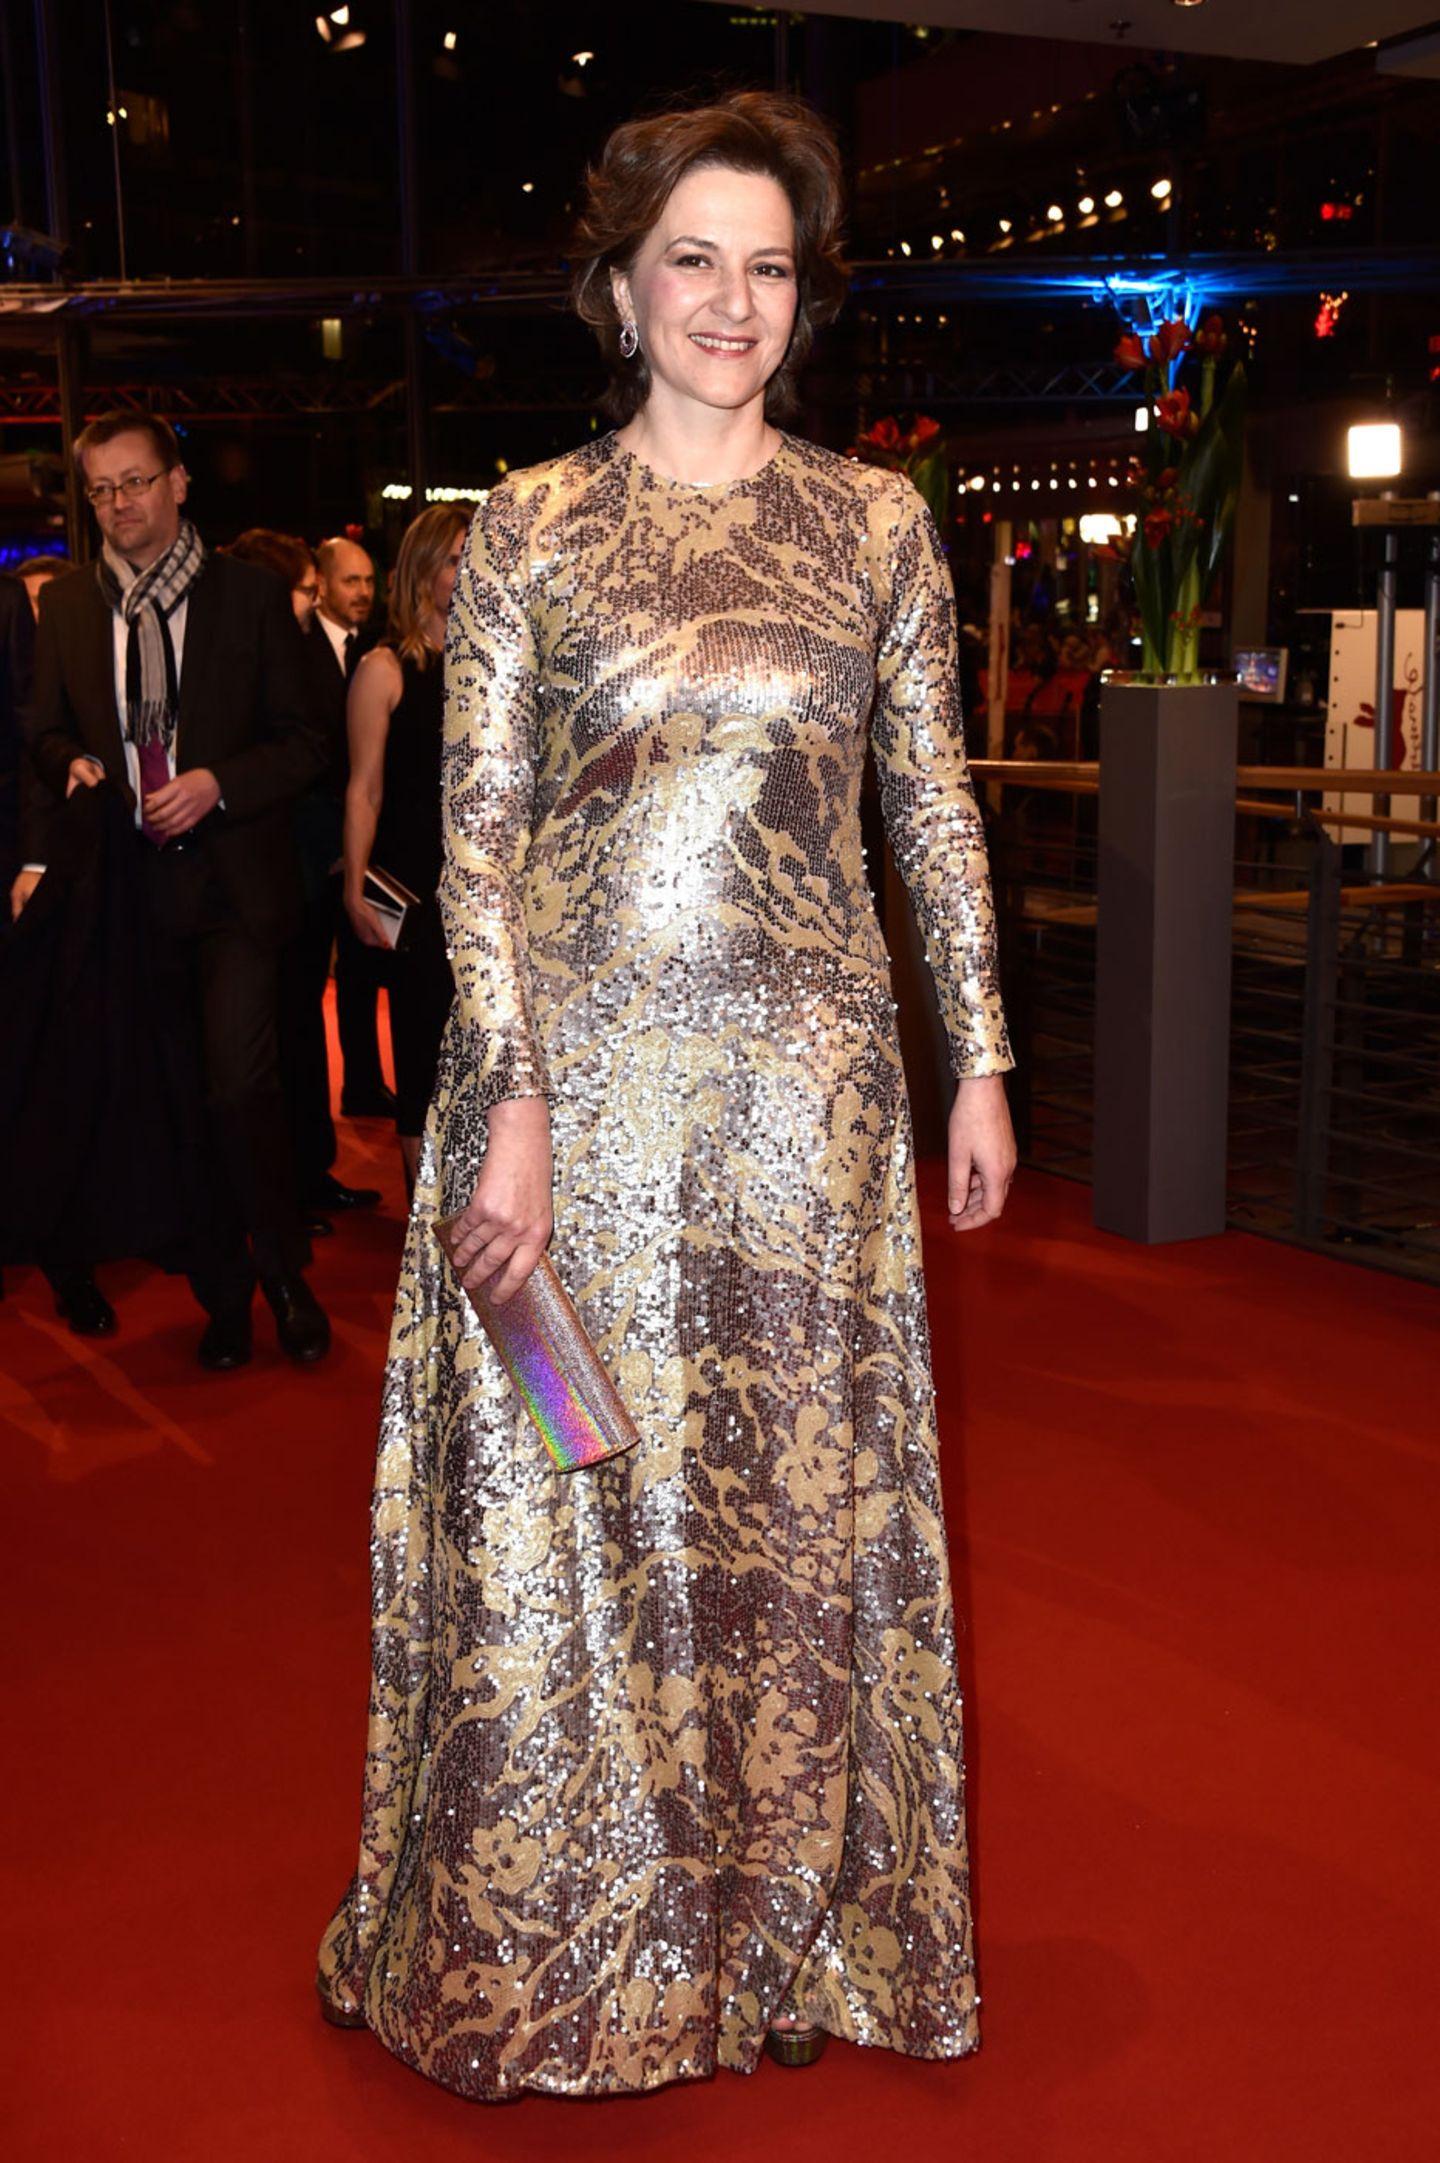 Berlinale 2016: Martina Gedeck